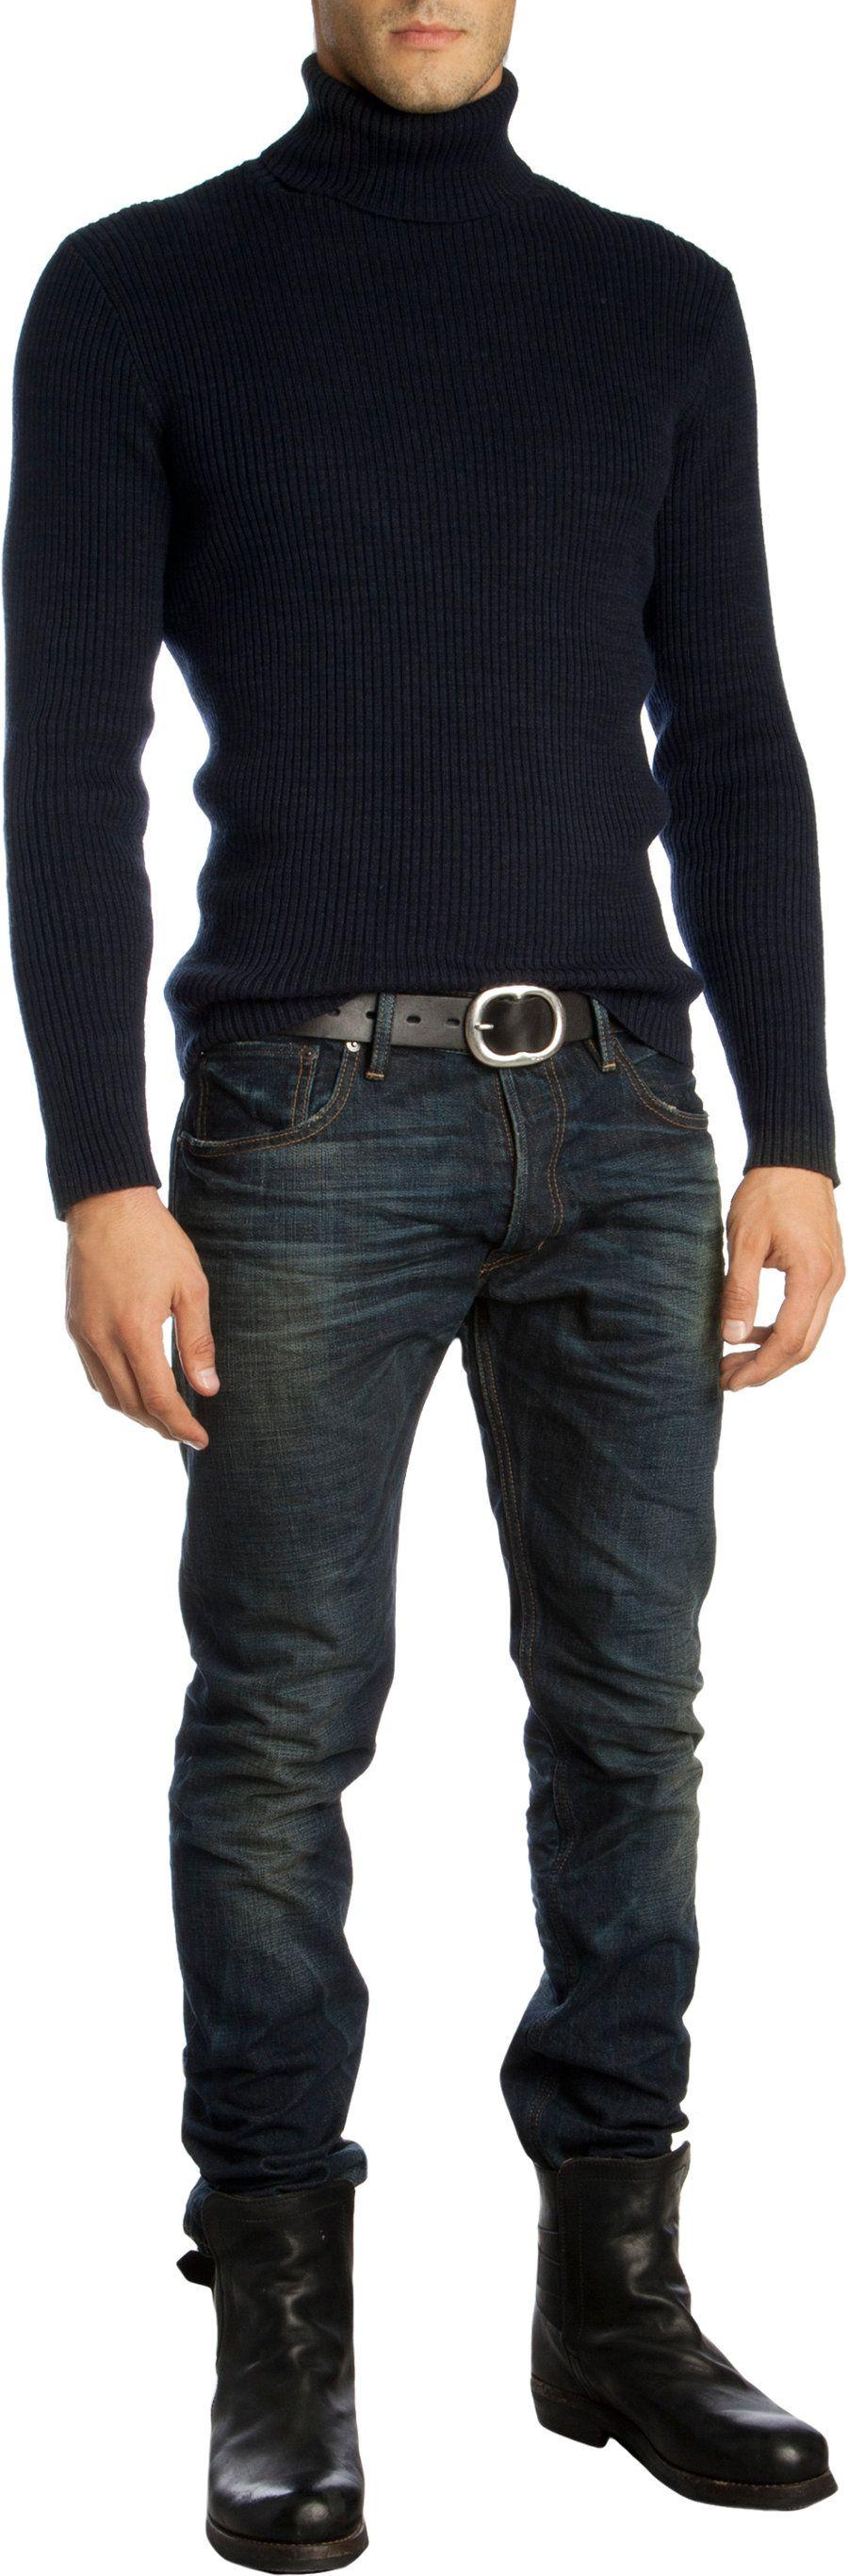 Ralph Lauren Black Label Denim Prospector Jean. Well fitting black turtleneck.